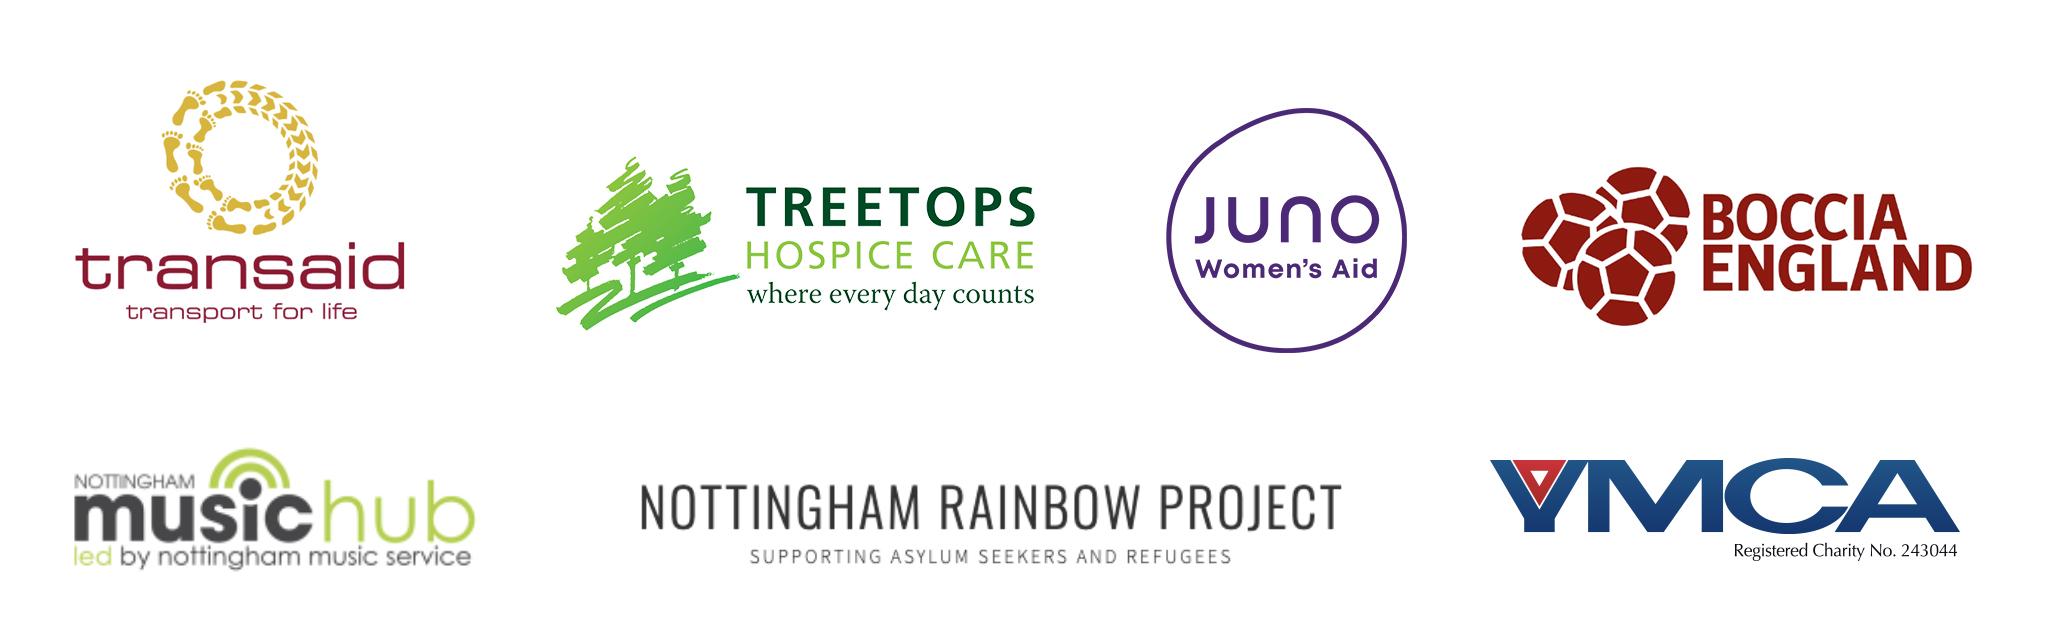 Charity branding logos